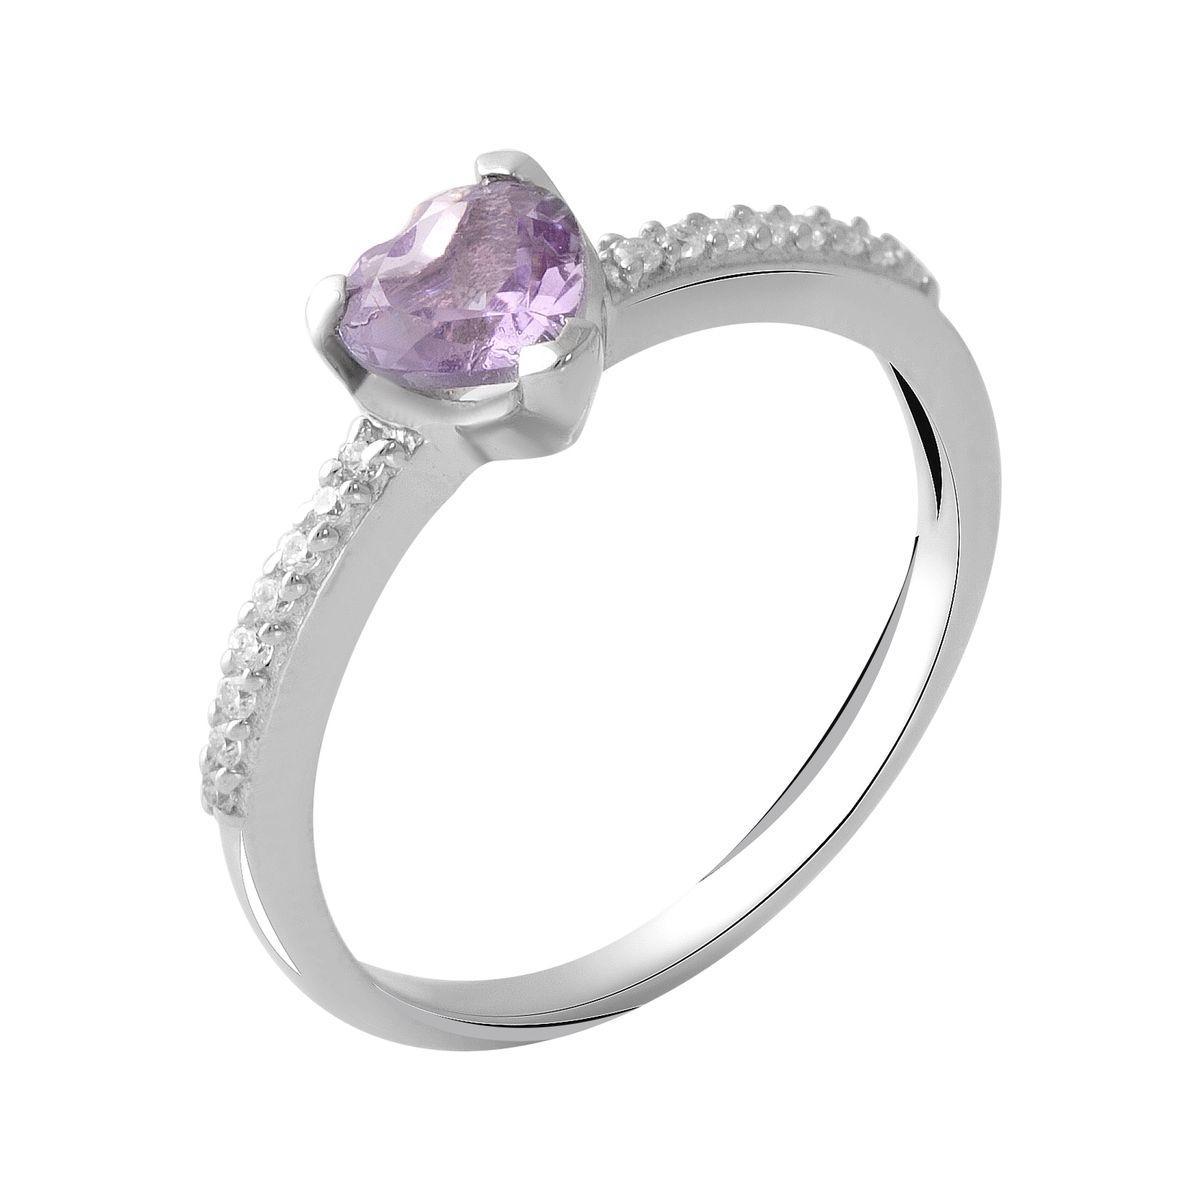 Серебряное кольцо DreamJewelry с натуральным аметистом 0.69ct (2048824) 18 размер